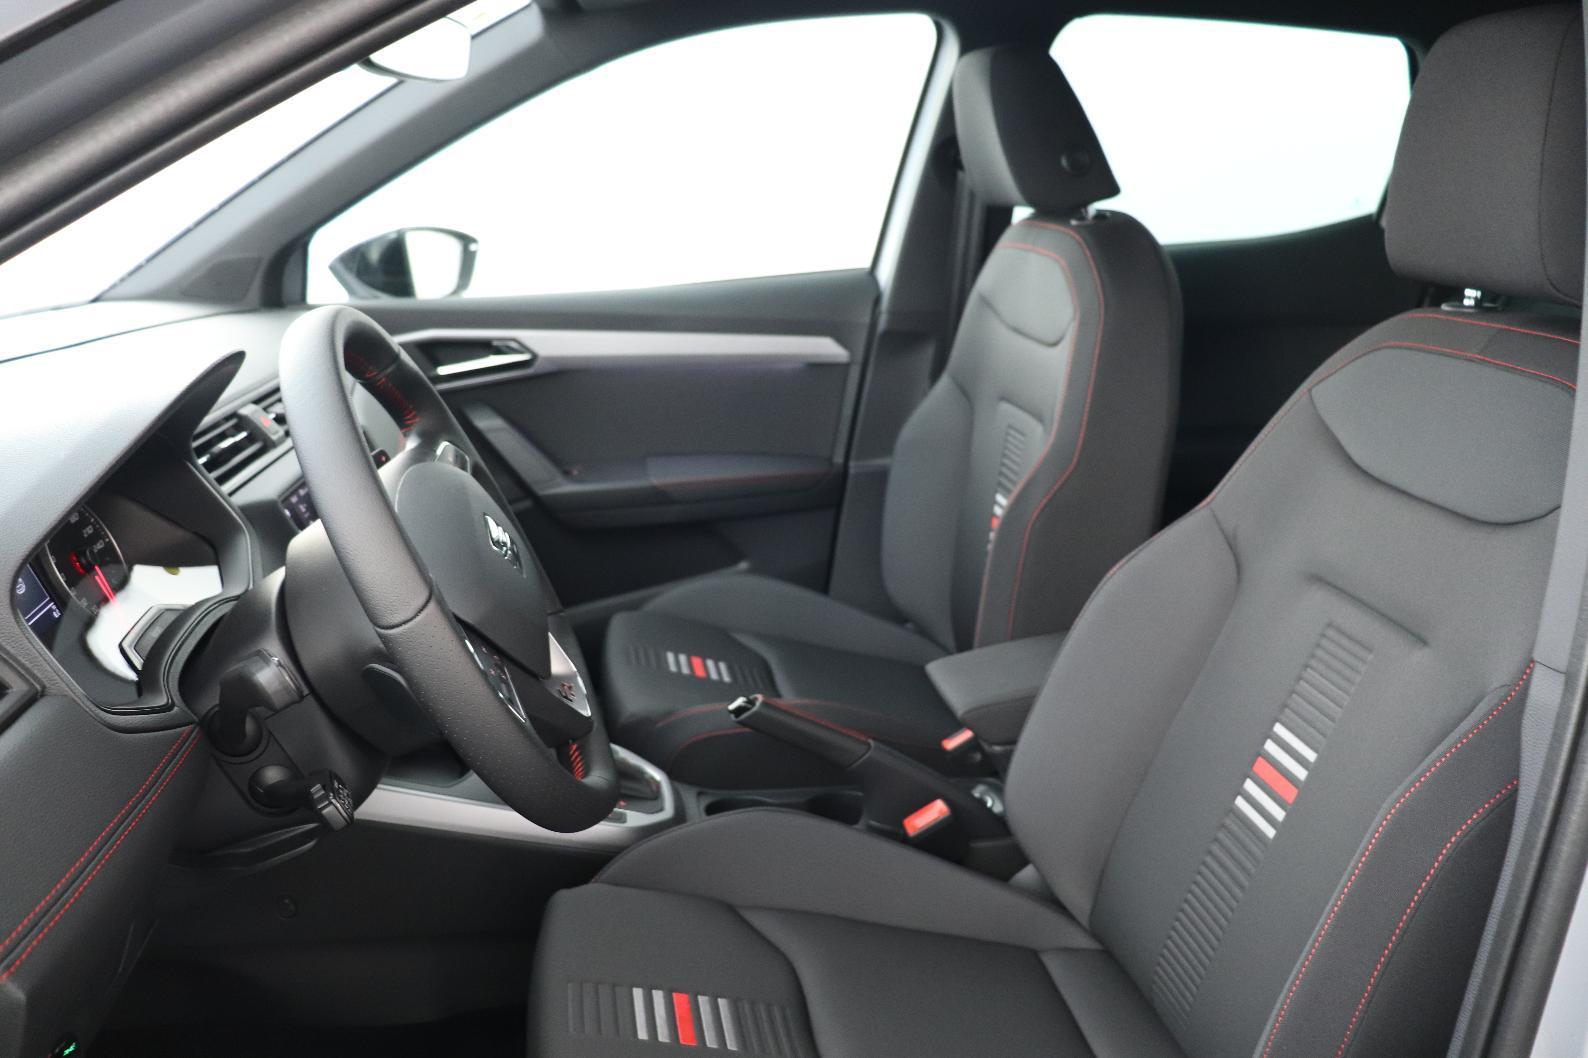 SEAT Arona 1.0 EcoTSI 110 ch Start/Stop DSG7 FR